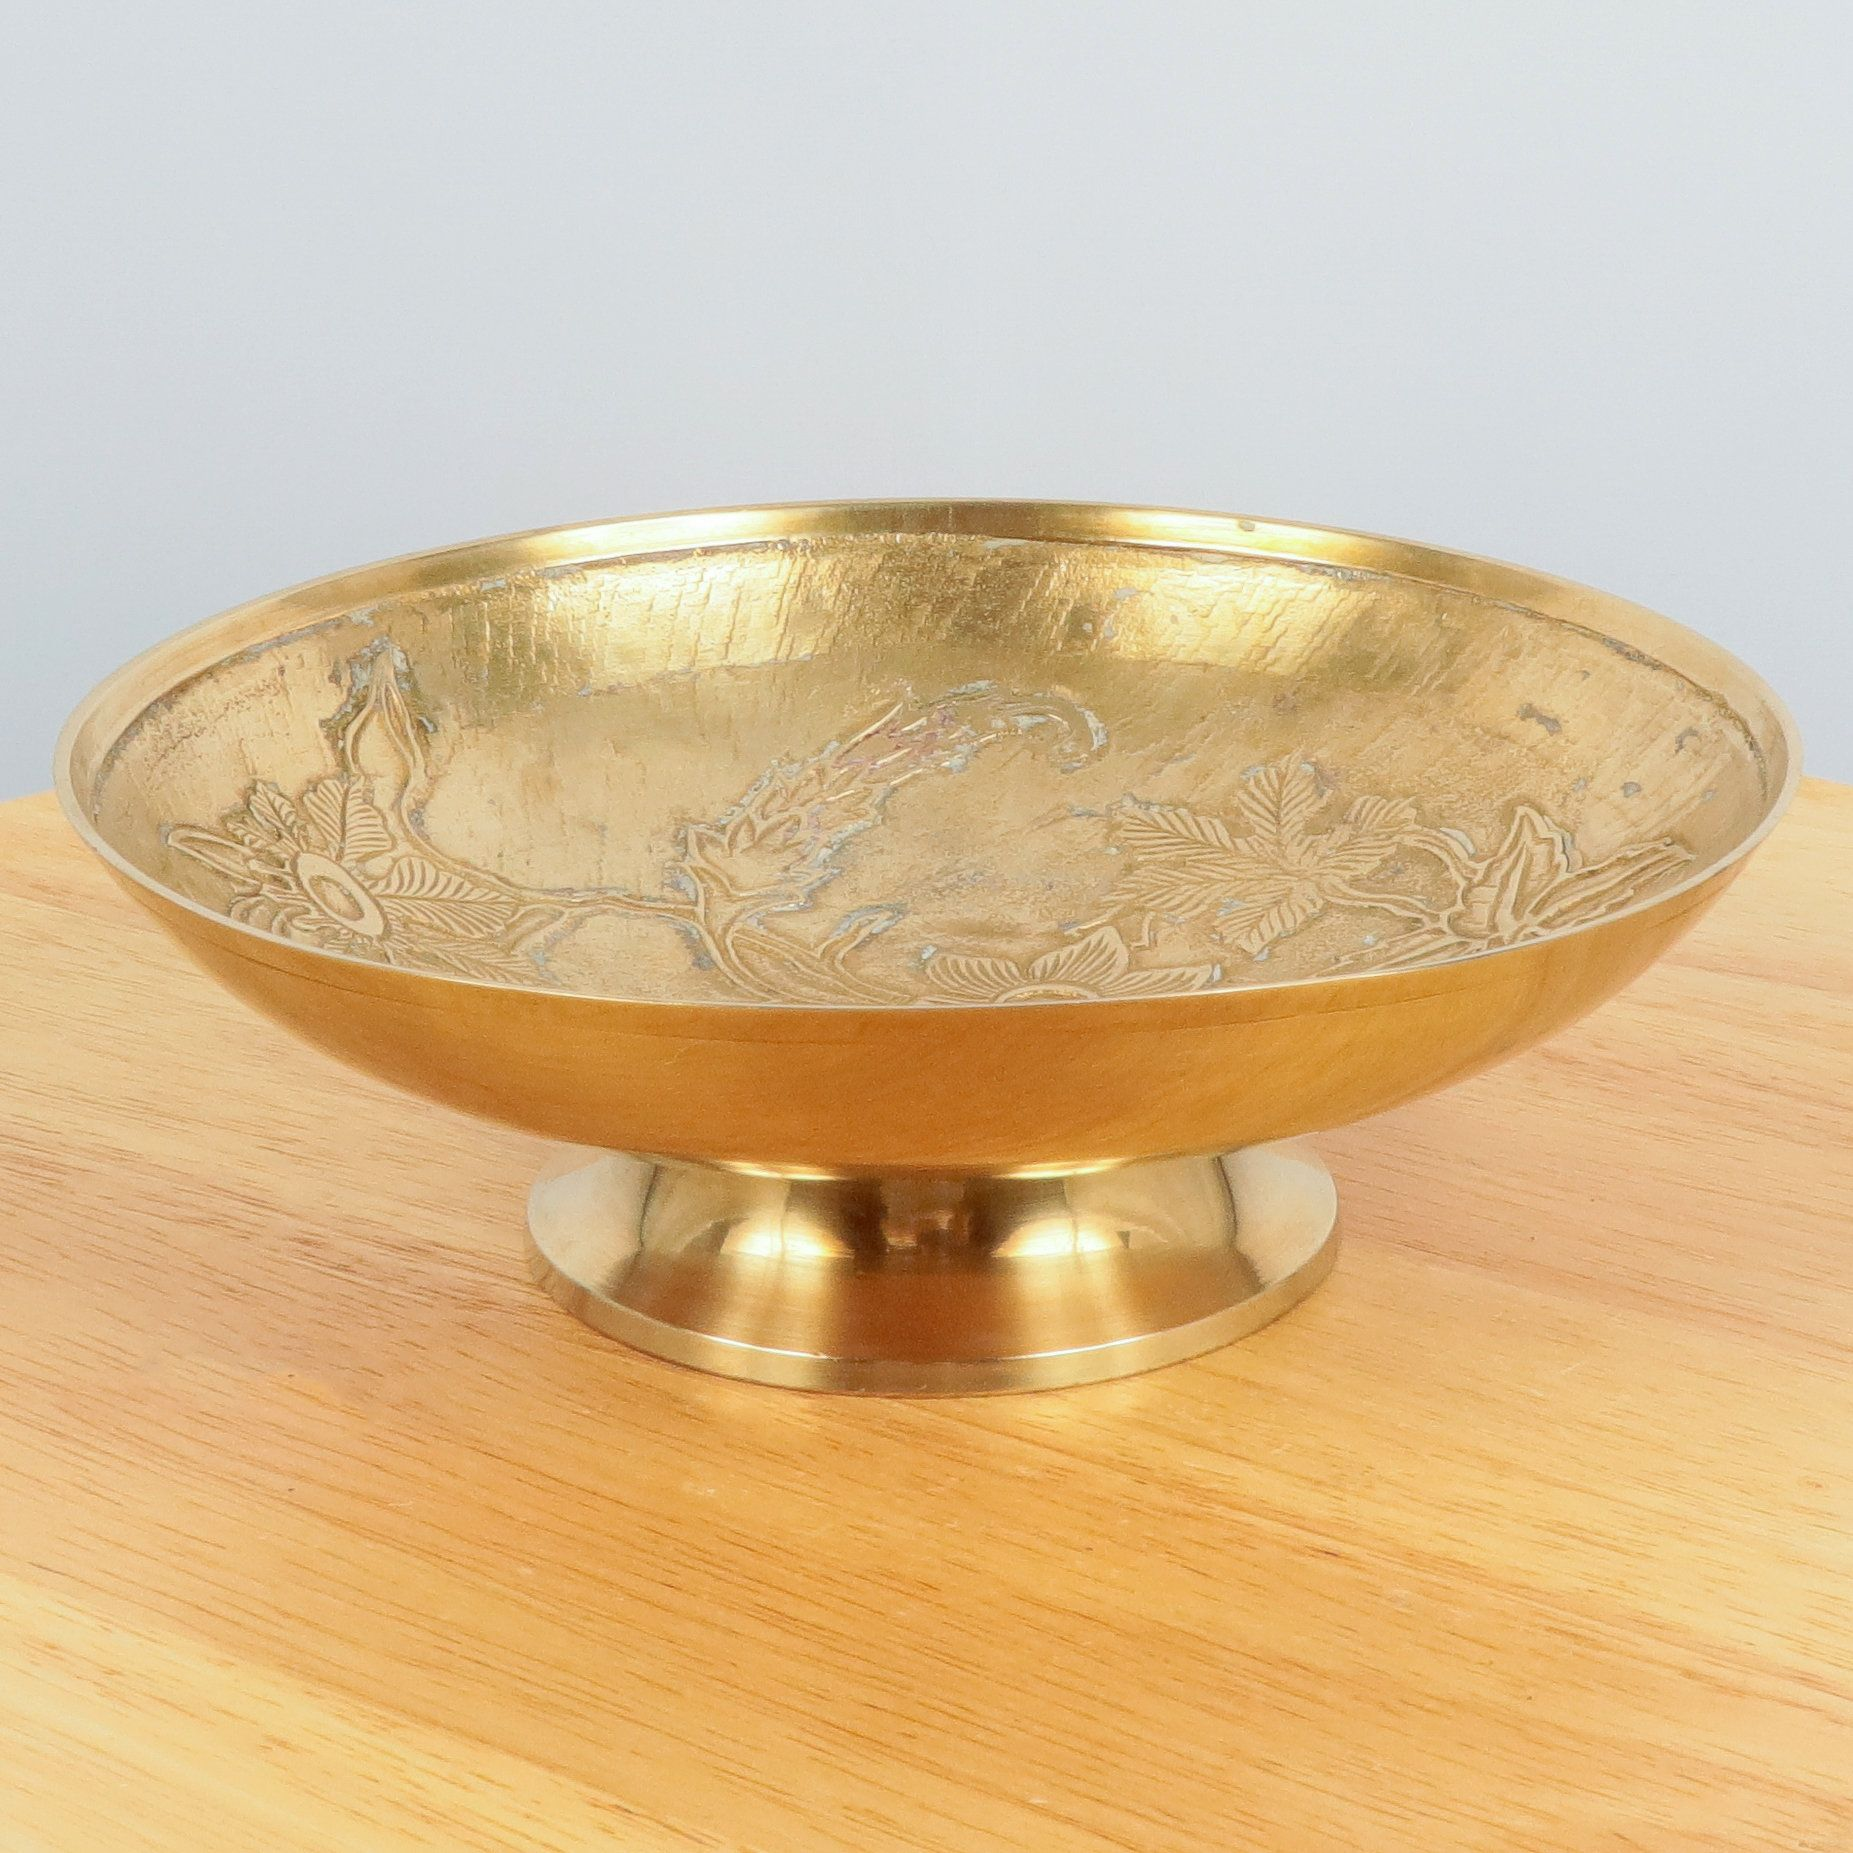 Brass embellished bowl Unique brass bowl Intricate brass decor Italian decor Entryway Brass italian bowl Scalloped brass Vintage bowl